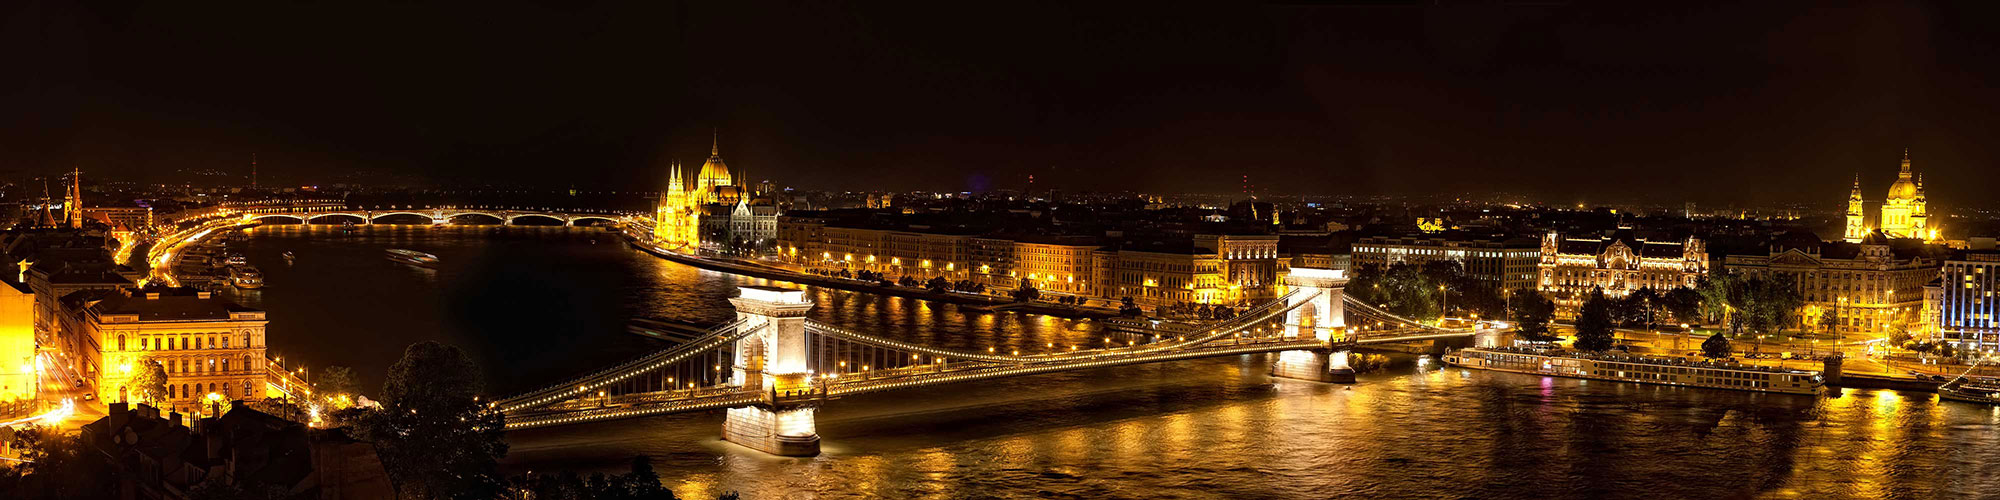 Budapest Hungary River at Night